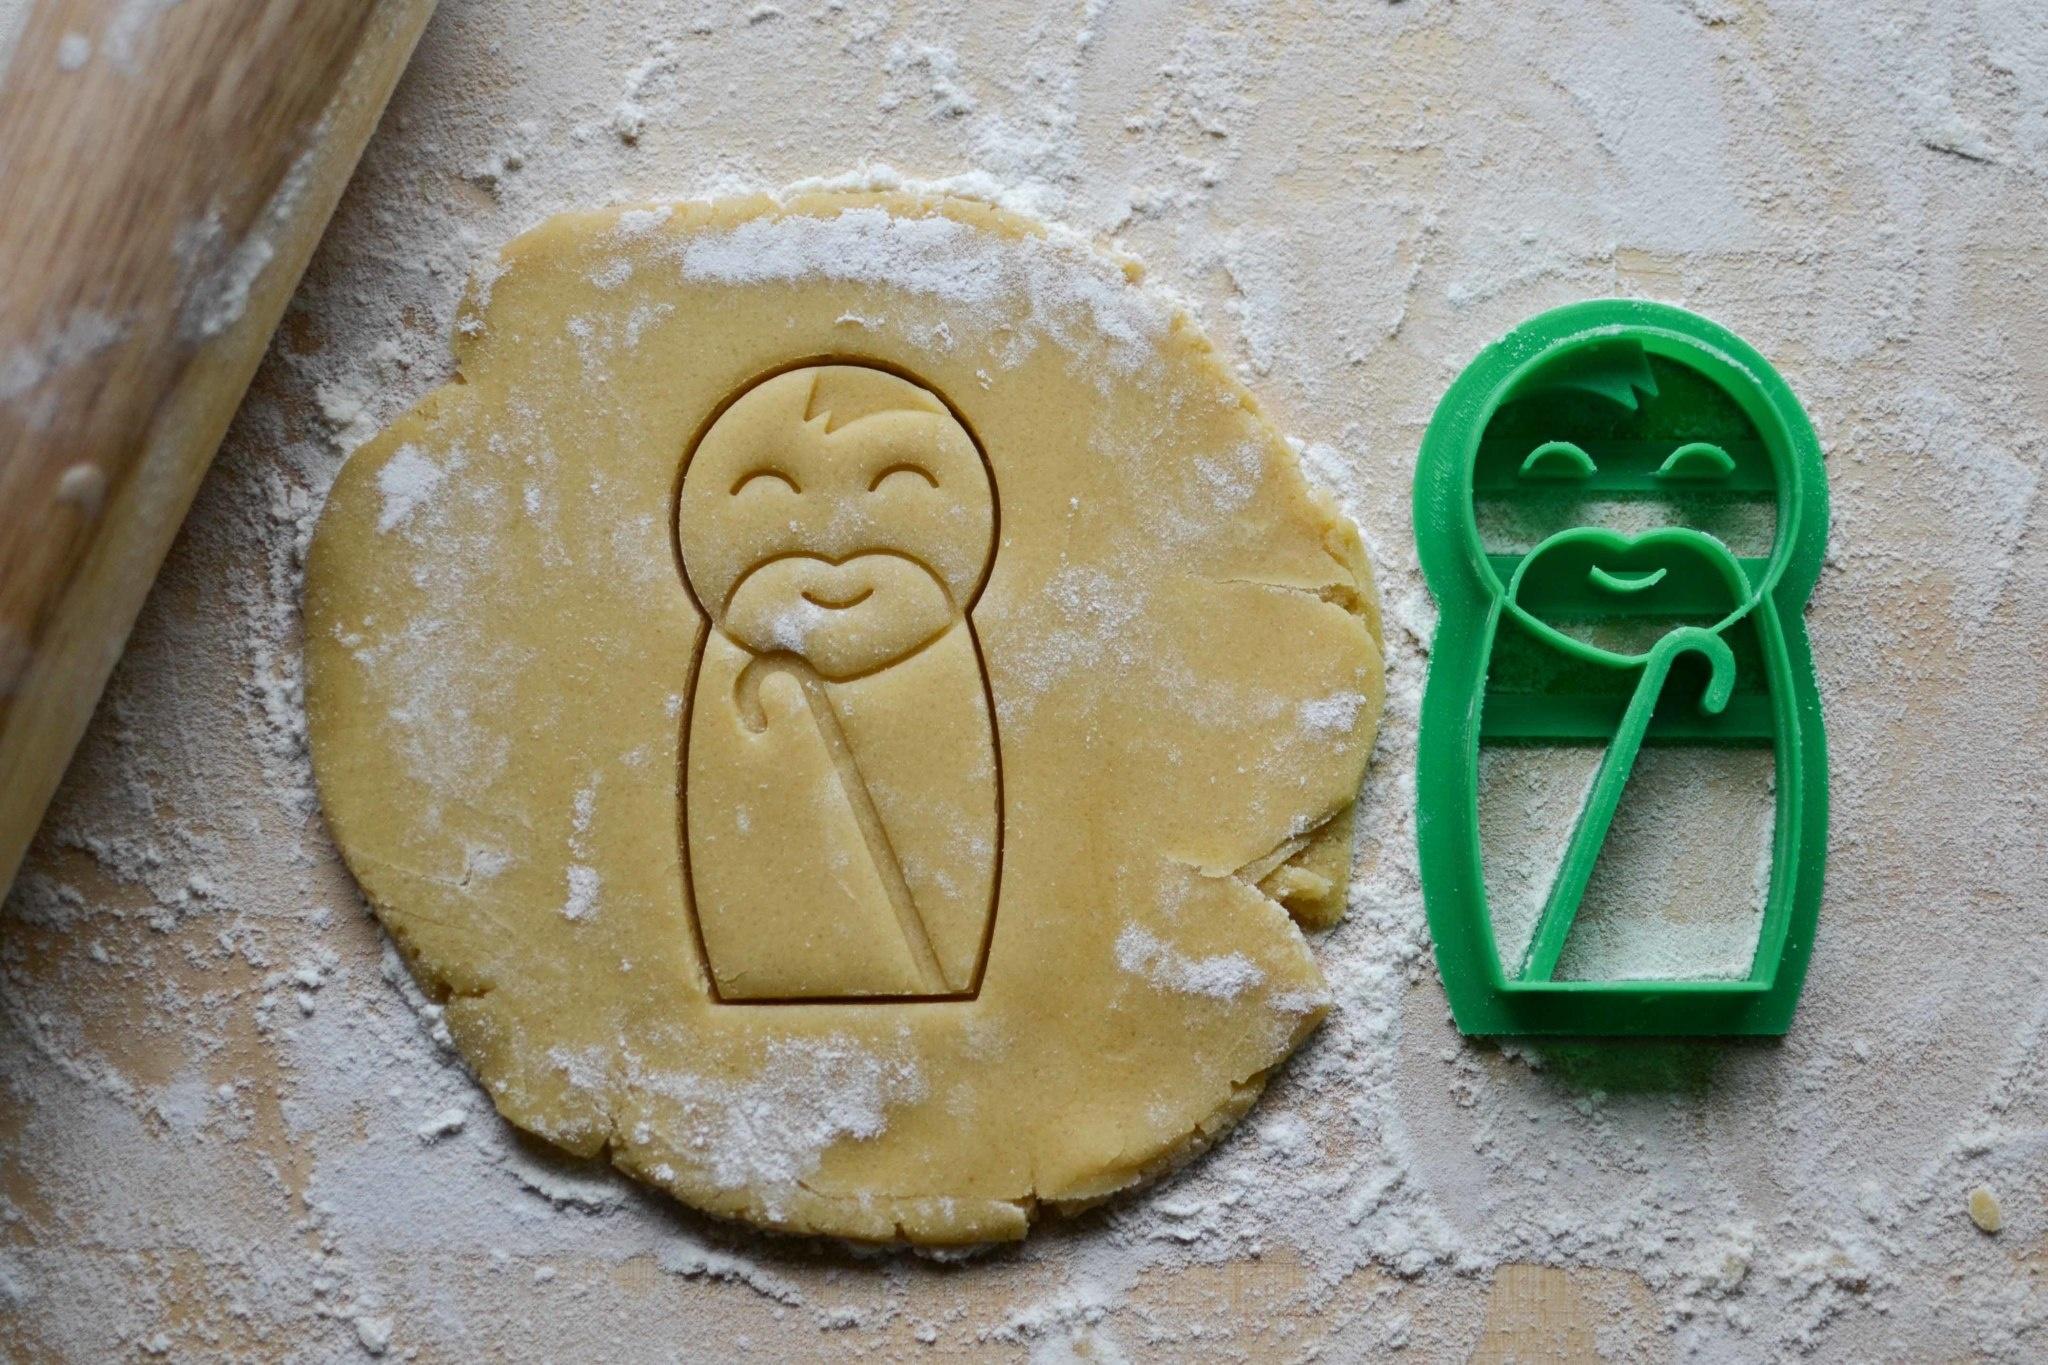 Catholic Curio St. Joseph Cookie Cutter